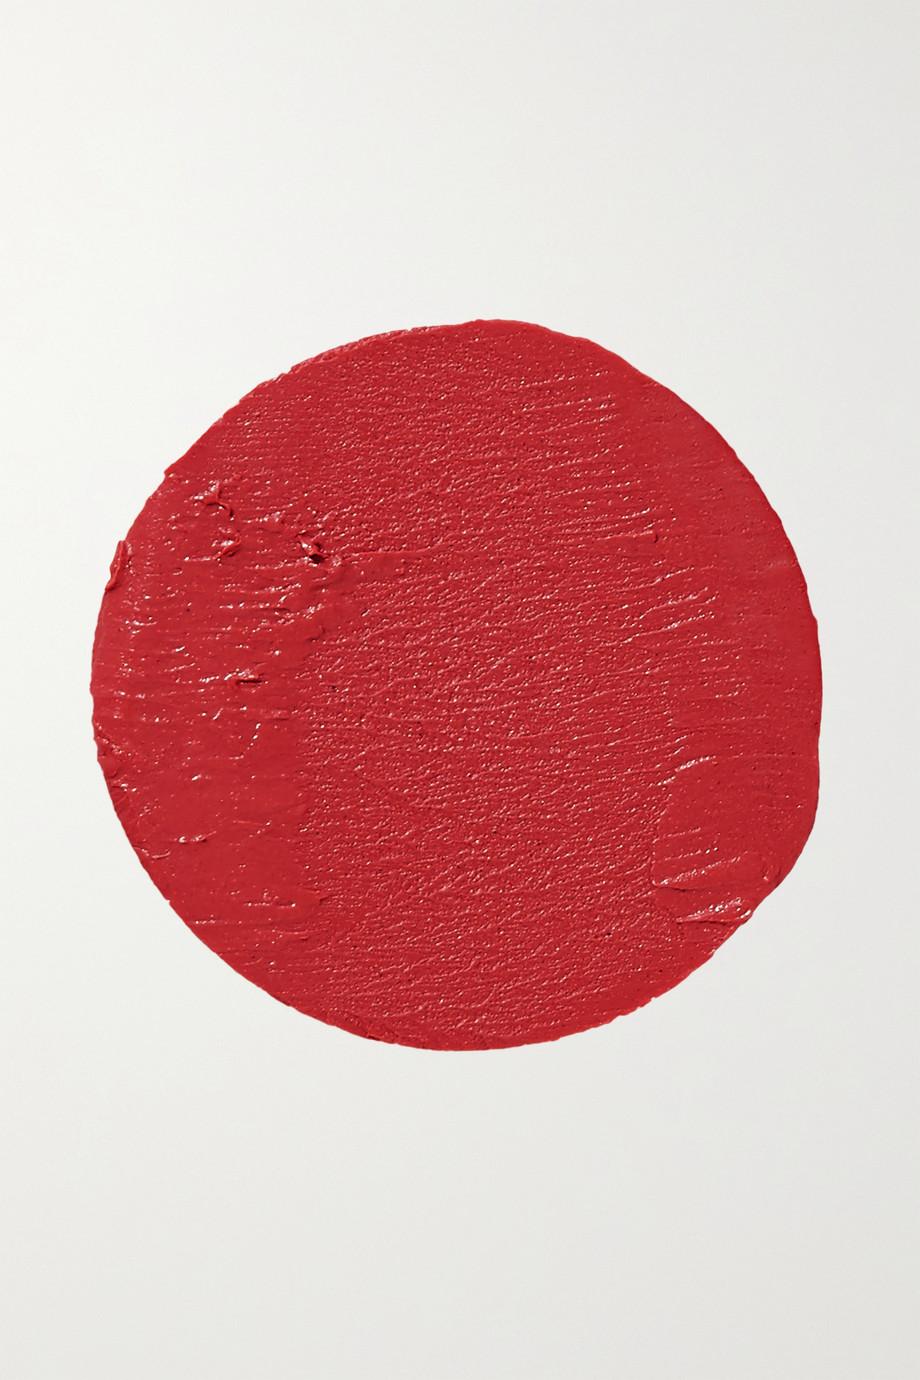 Oribe Lip Lust Crème Lipstick - The Red